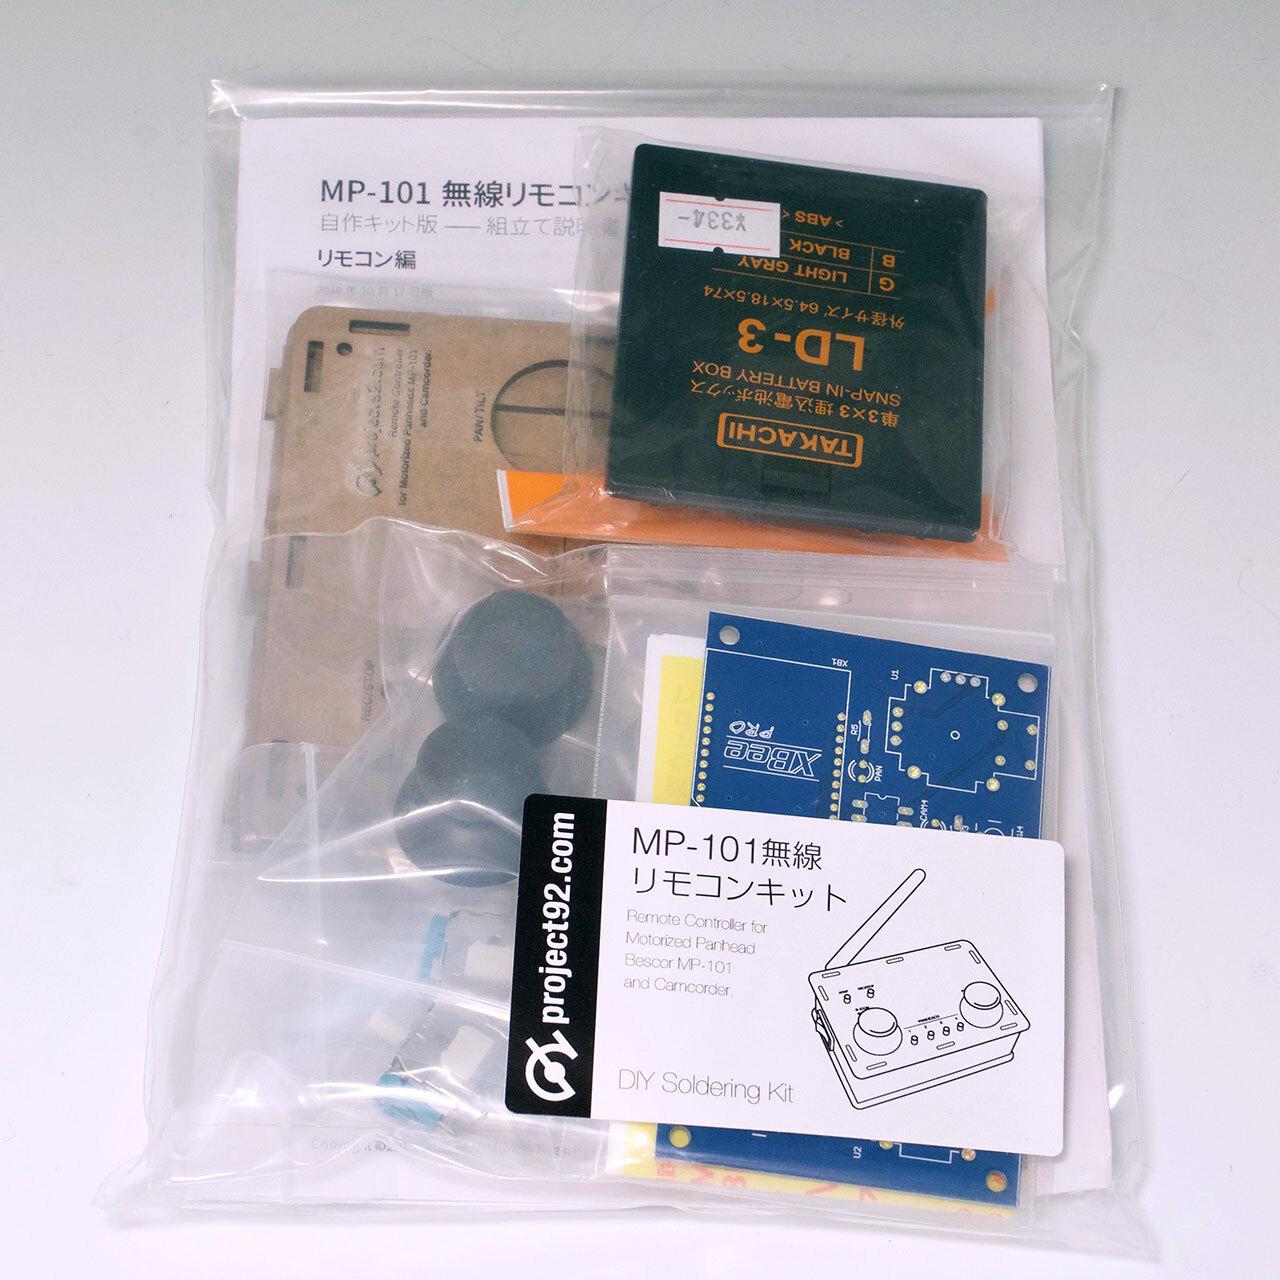 MP-101無線リモコンキット:リモコン(自作キット)